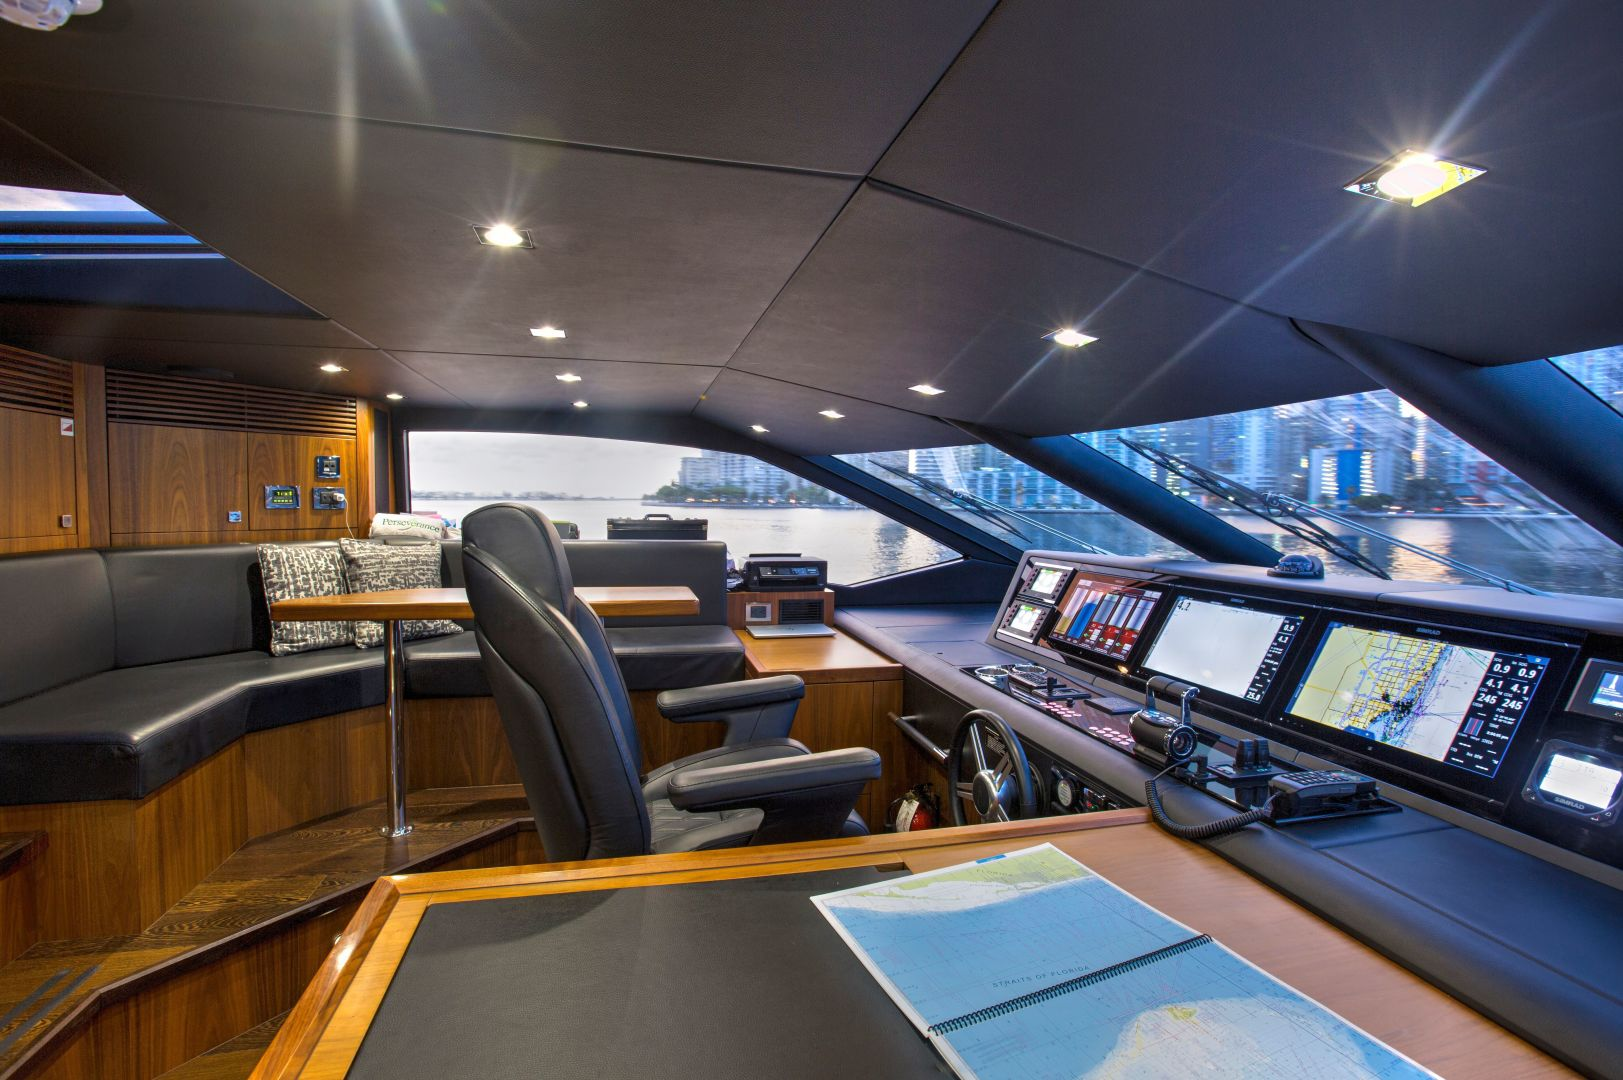 Sunseeker-95 Yacht 2017-Perseverance 3 Ft Lauderdale-Florida-United States-1400106   Thumbnail